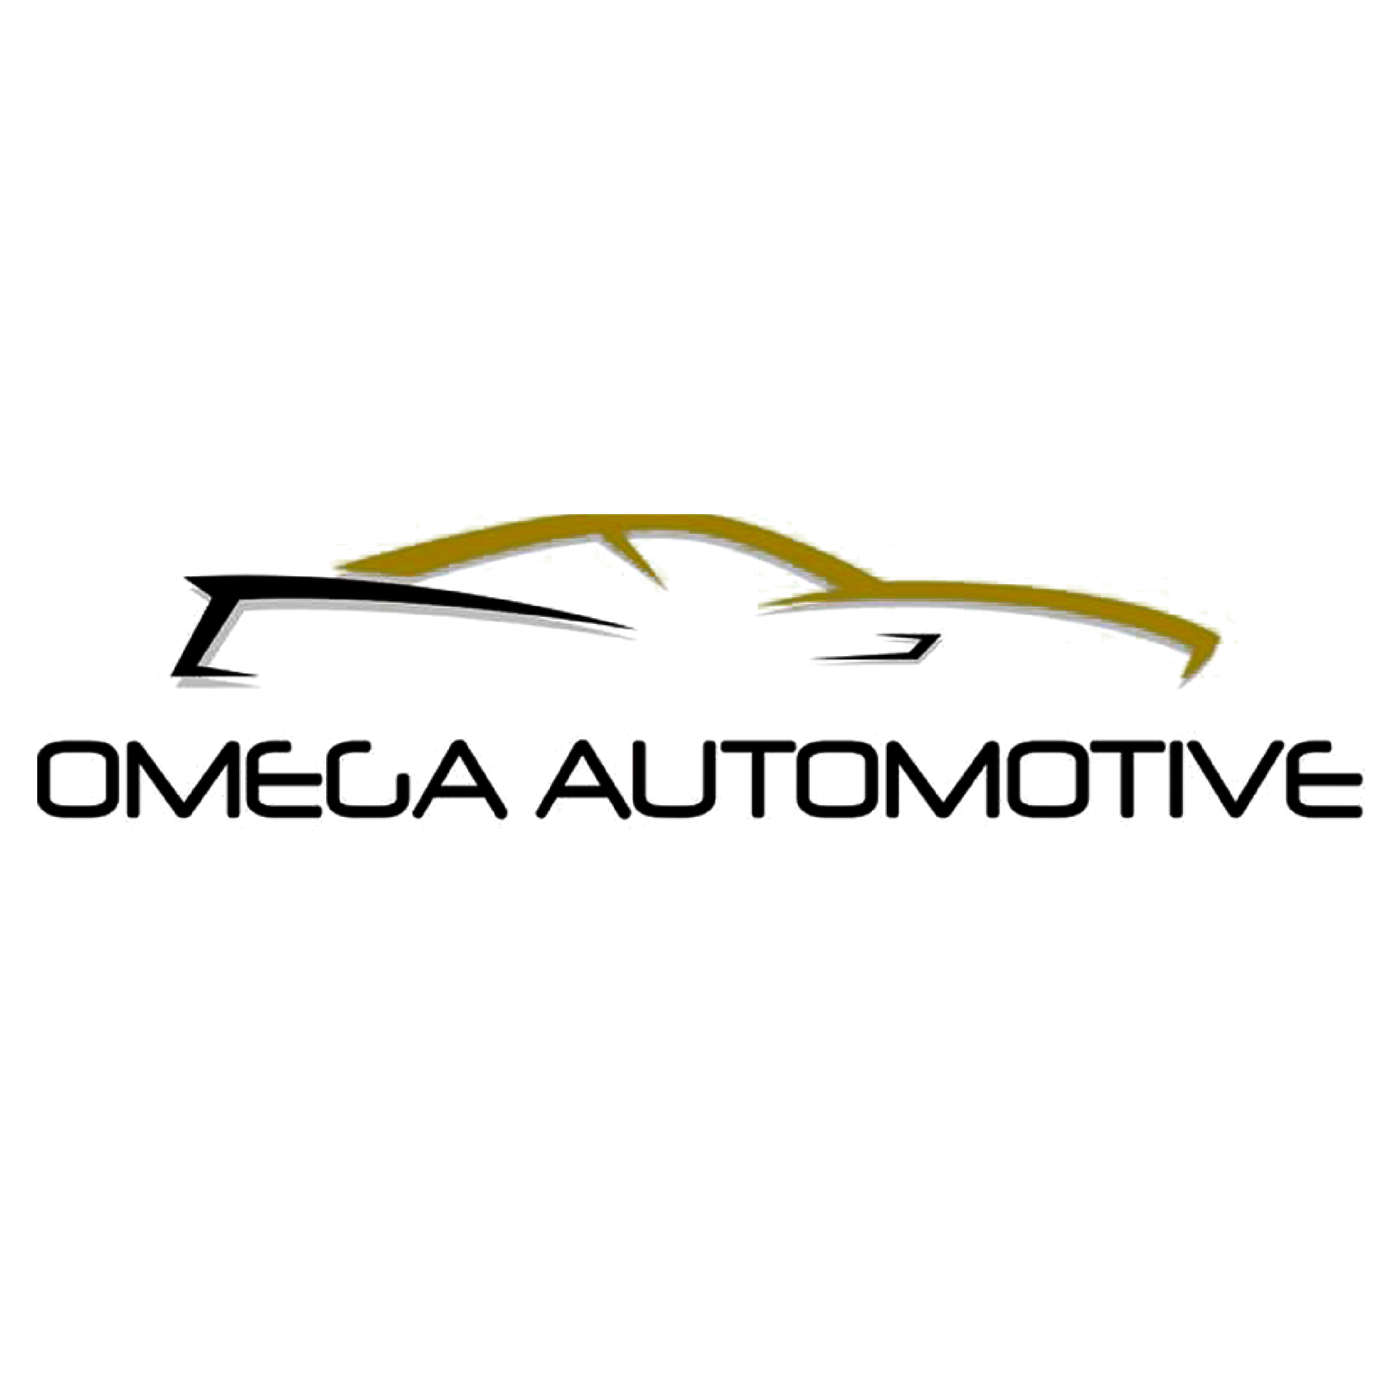 Omega Automotive Group